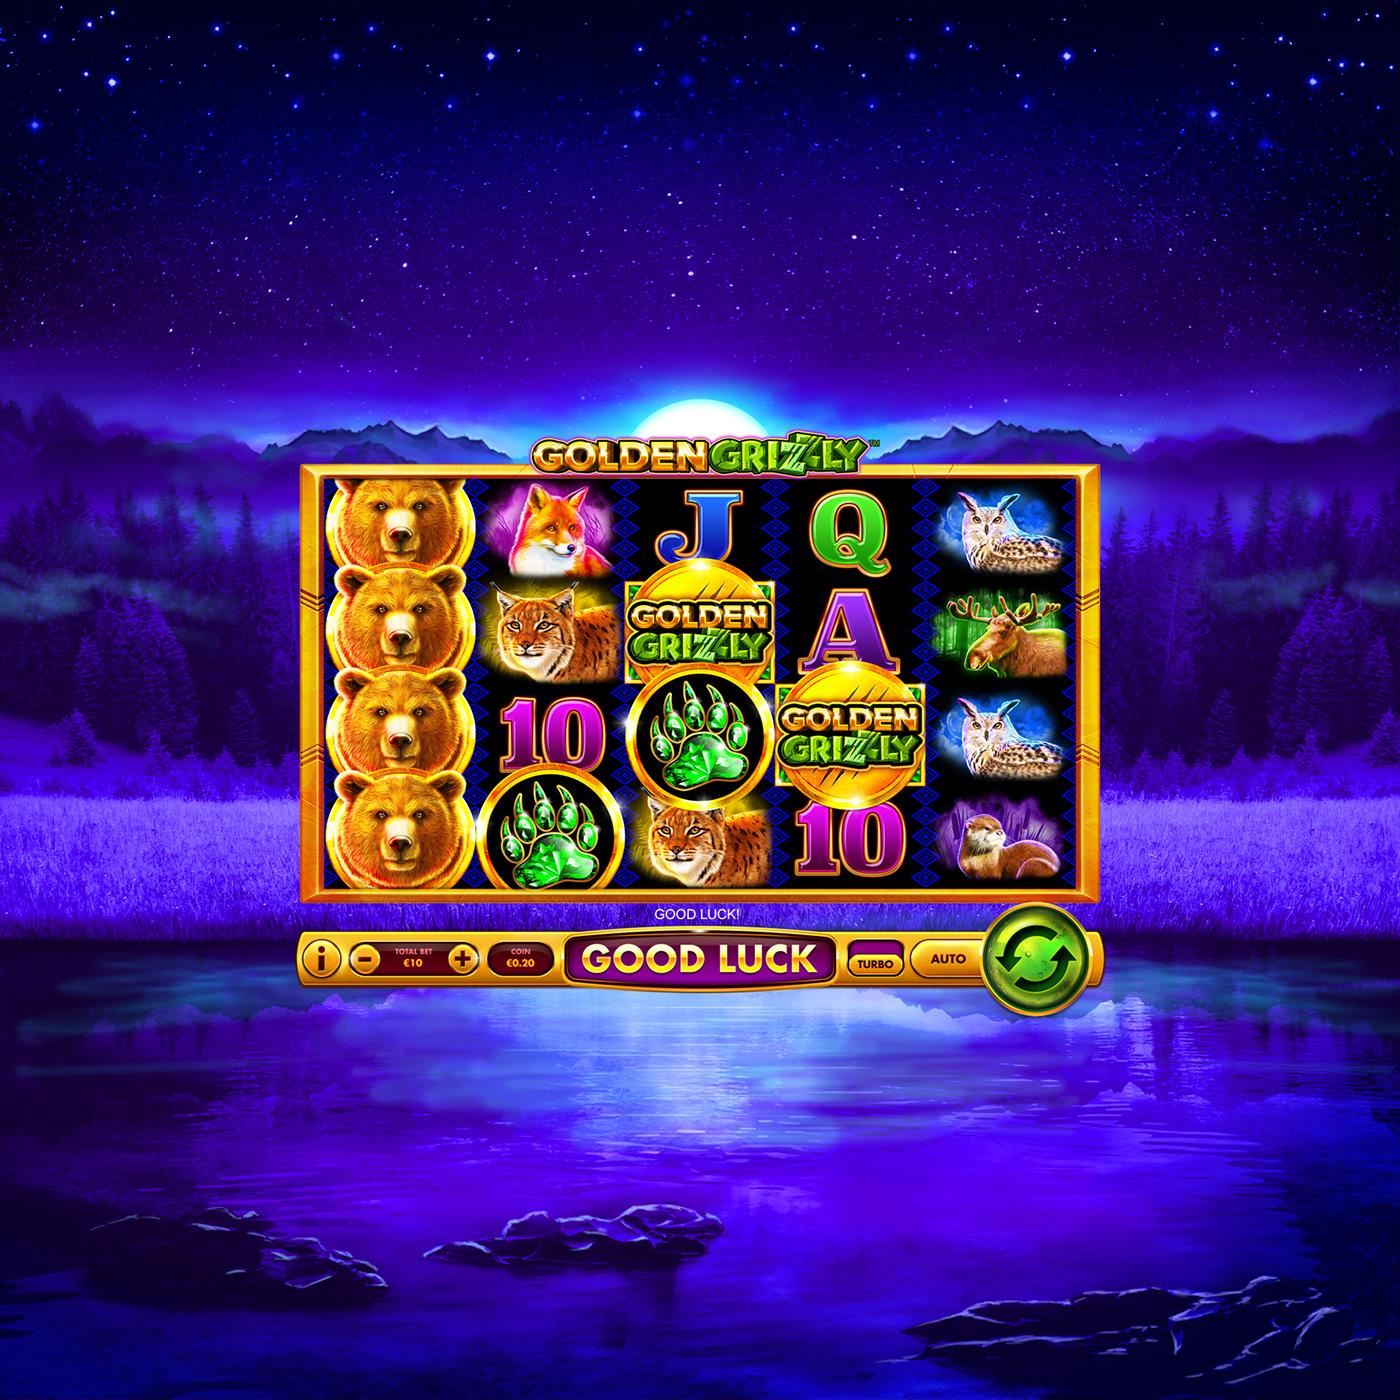 Grizzly Slot Machine